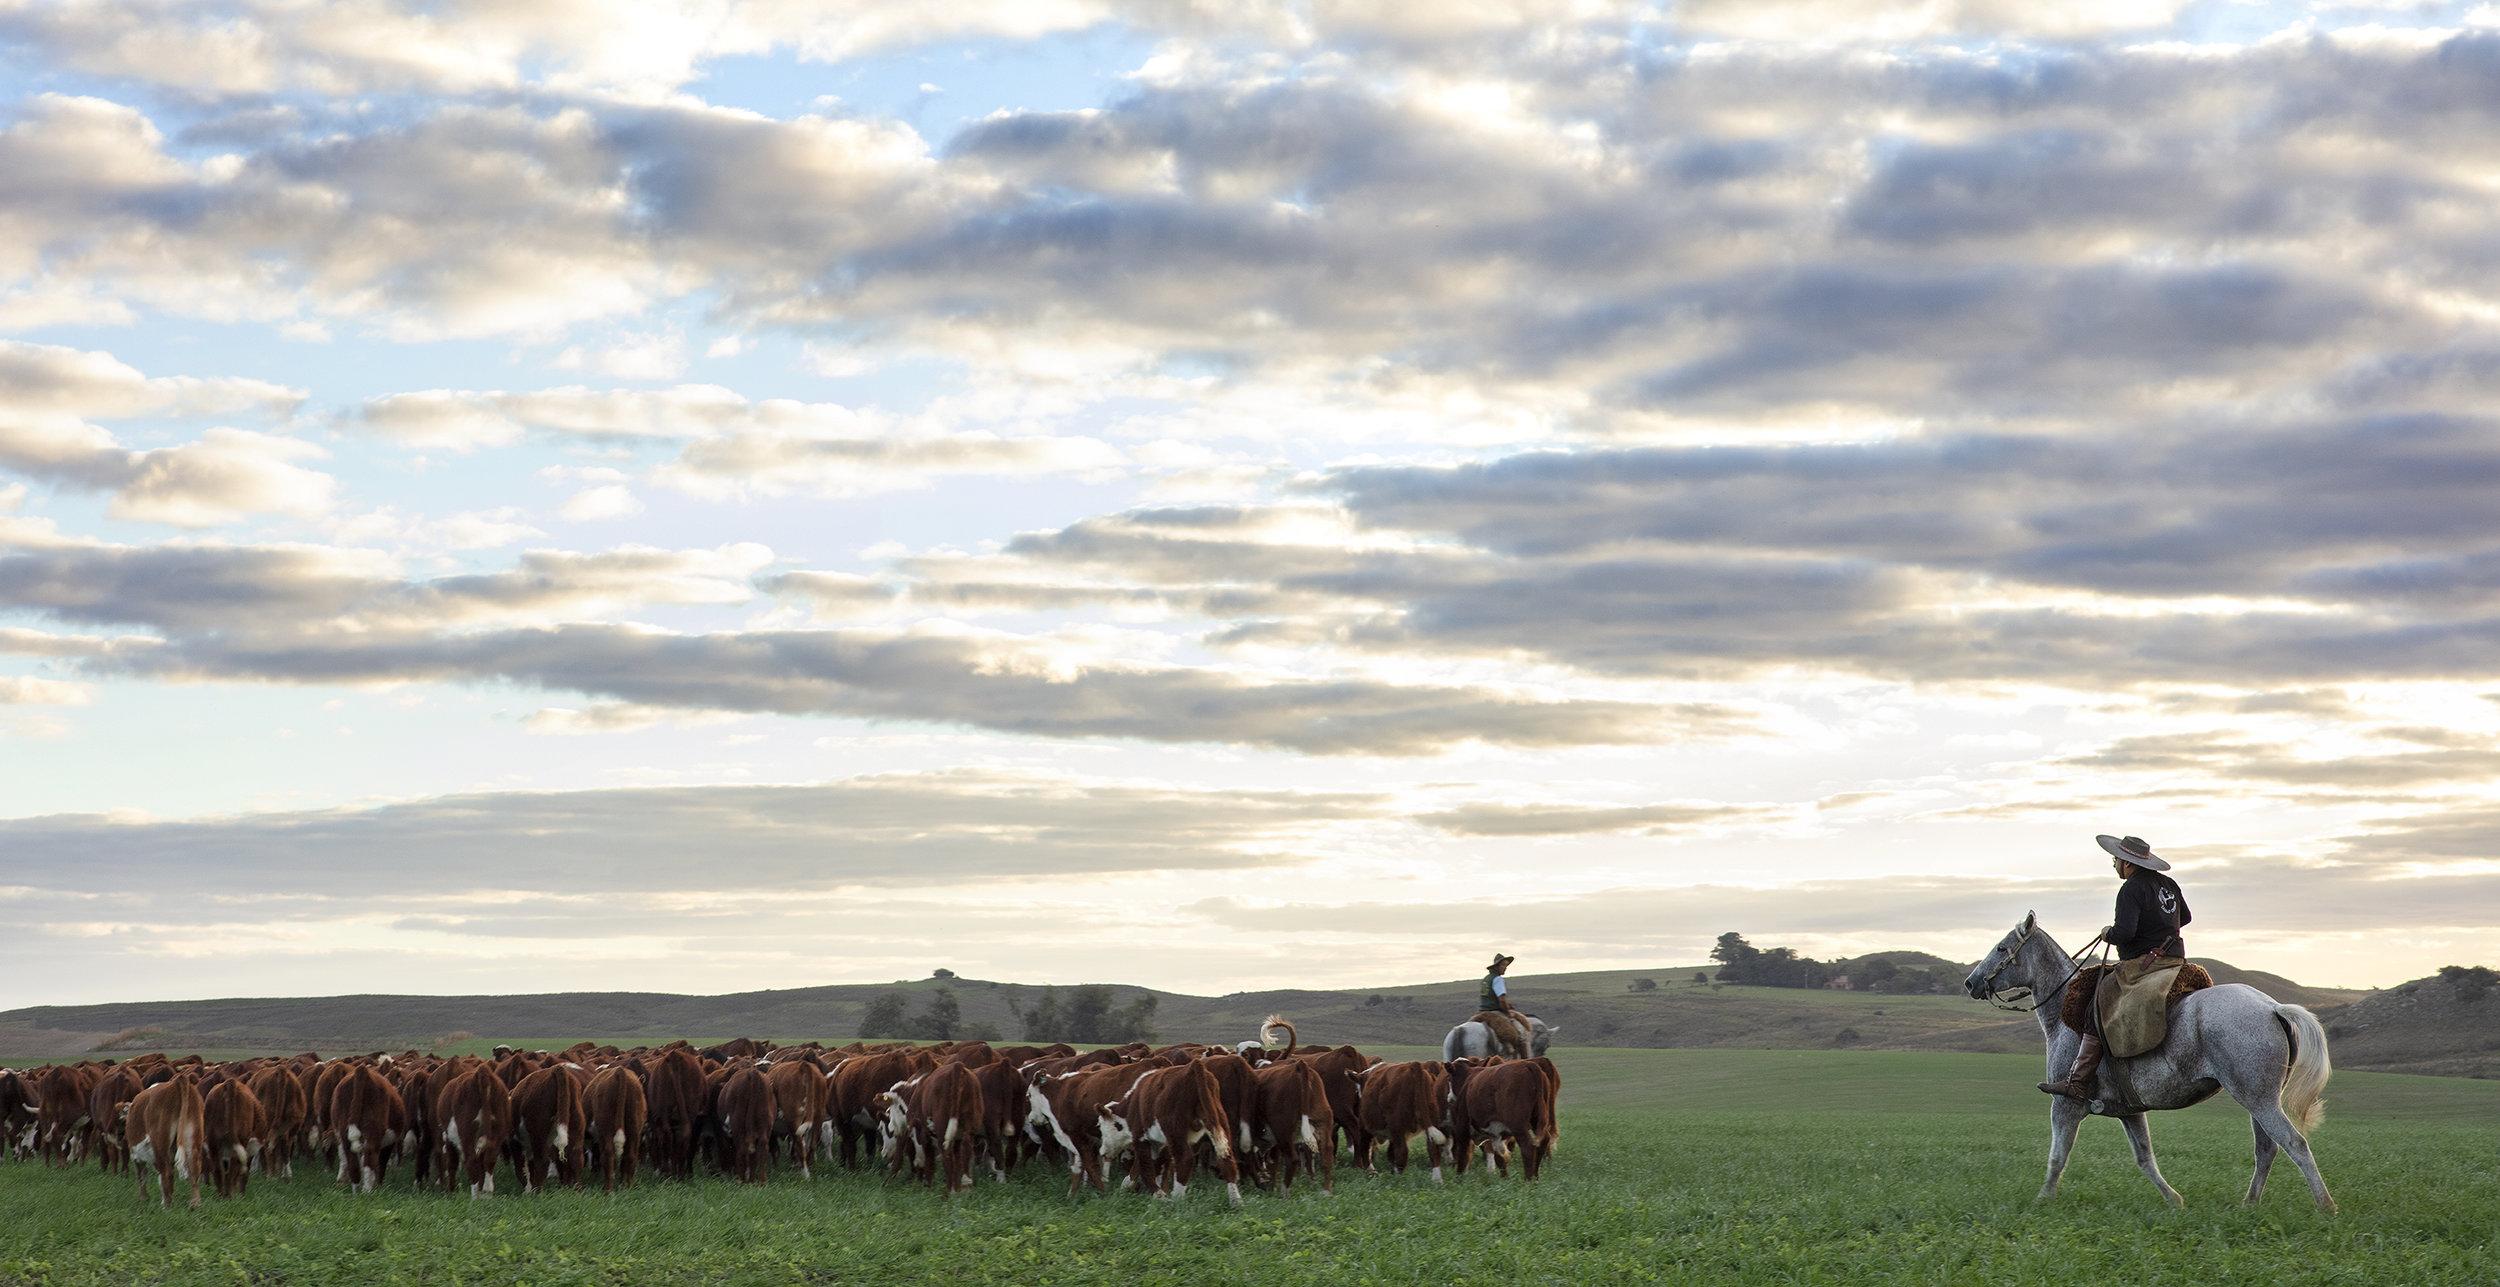 190417NH_brazil_maritza_farm_day1_2792.jpg